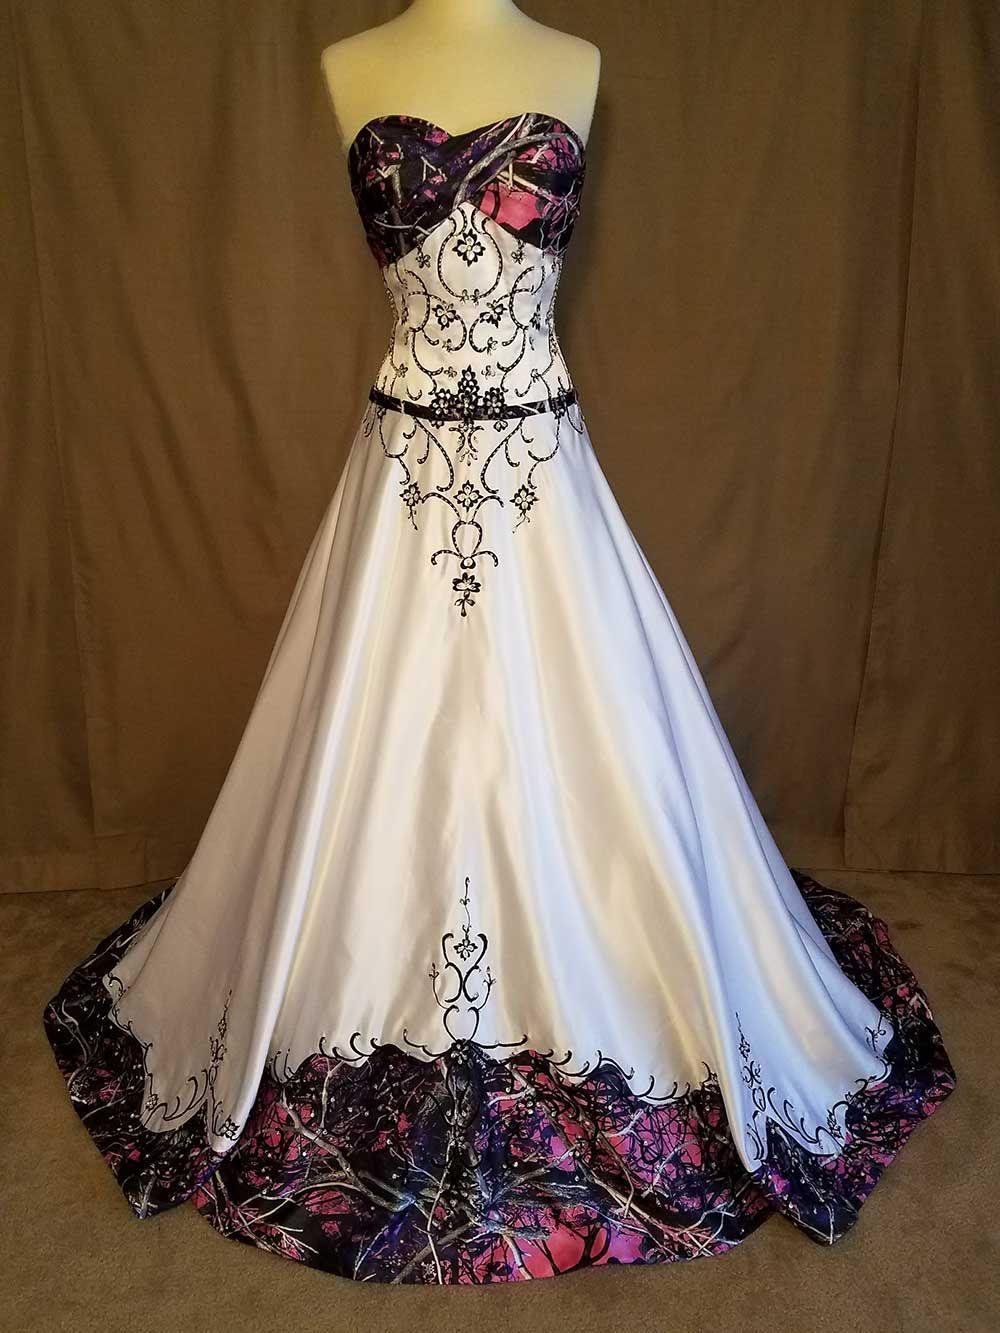 Brides Camo wedding dresses, Muddy girl camo wedding